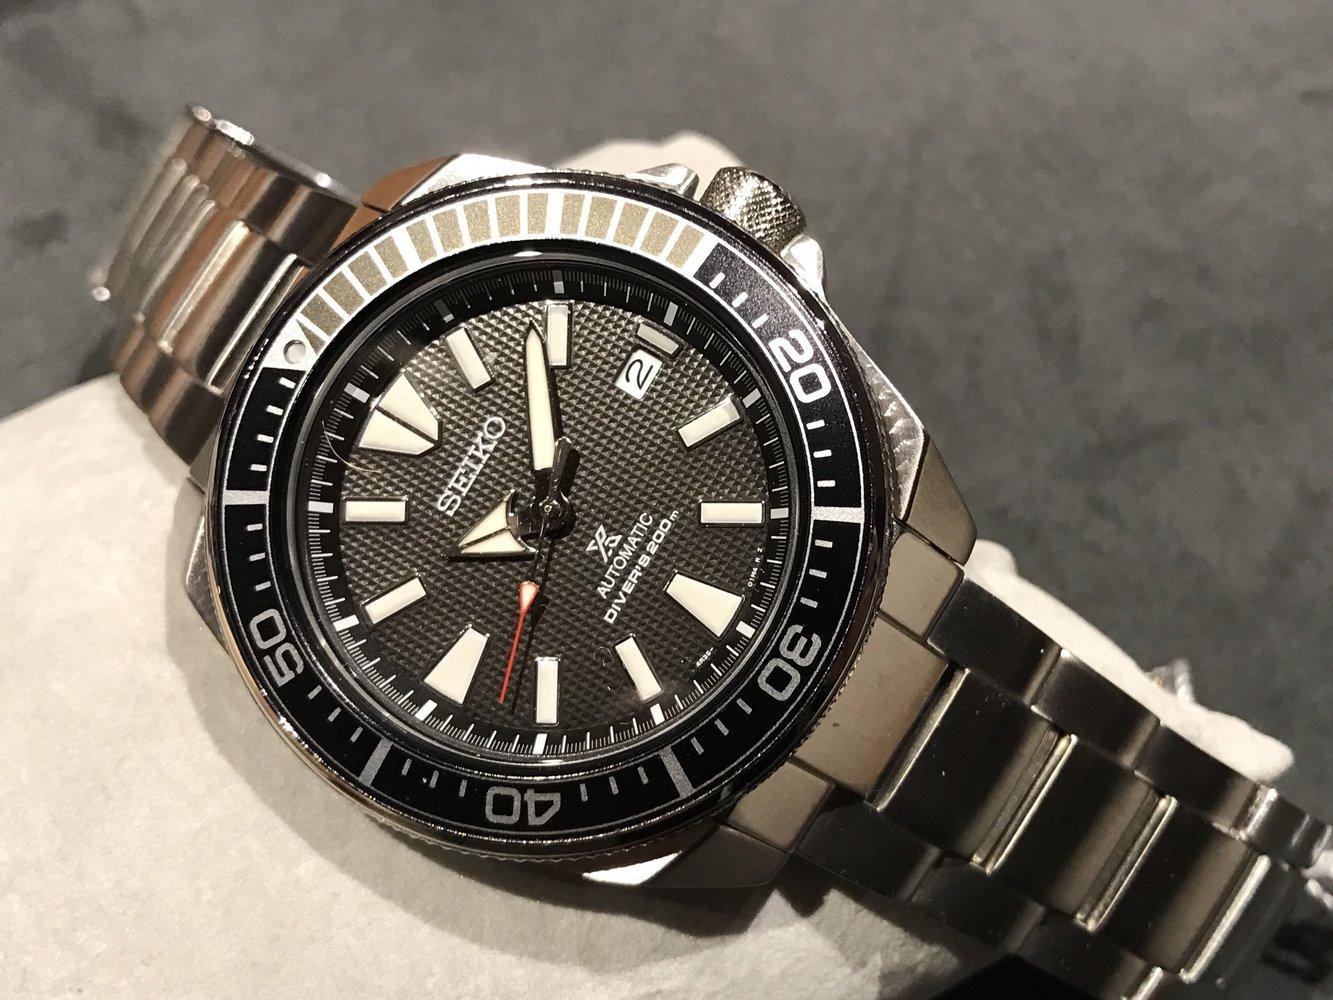 SRPB51 timepiece